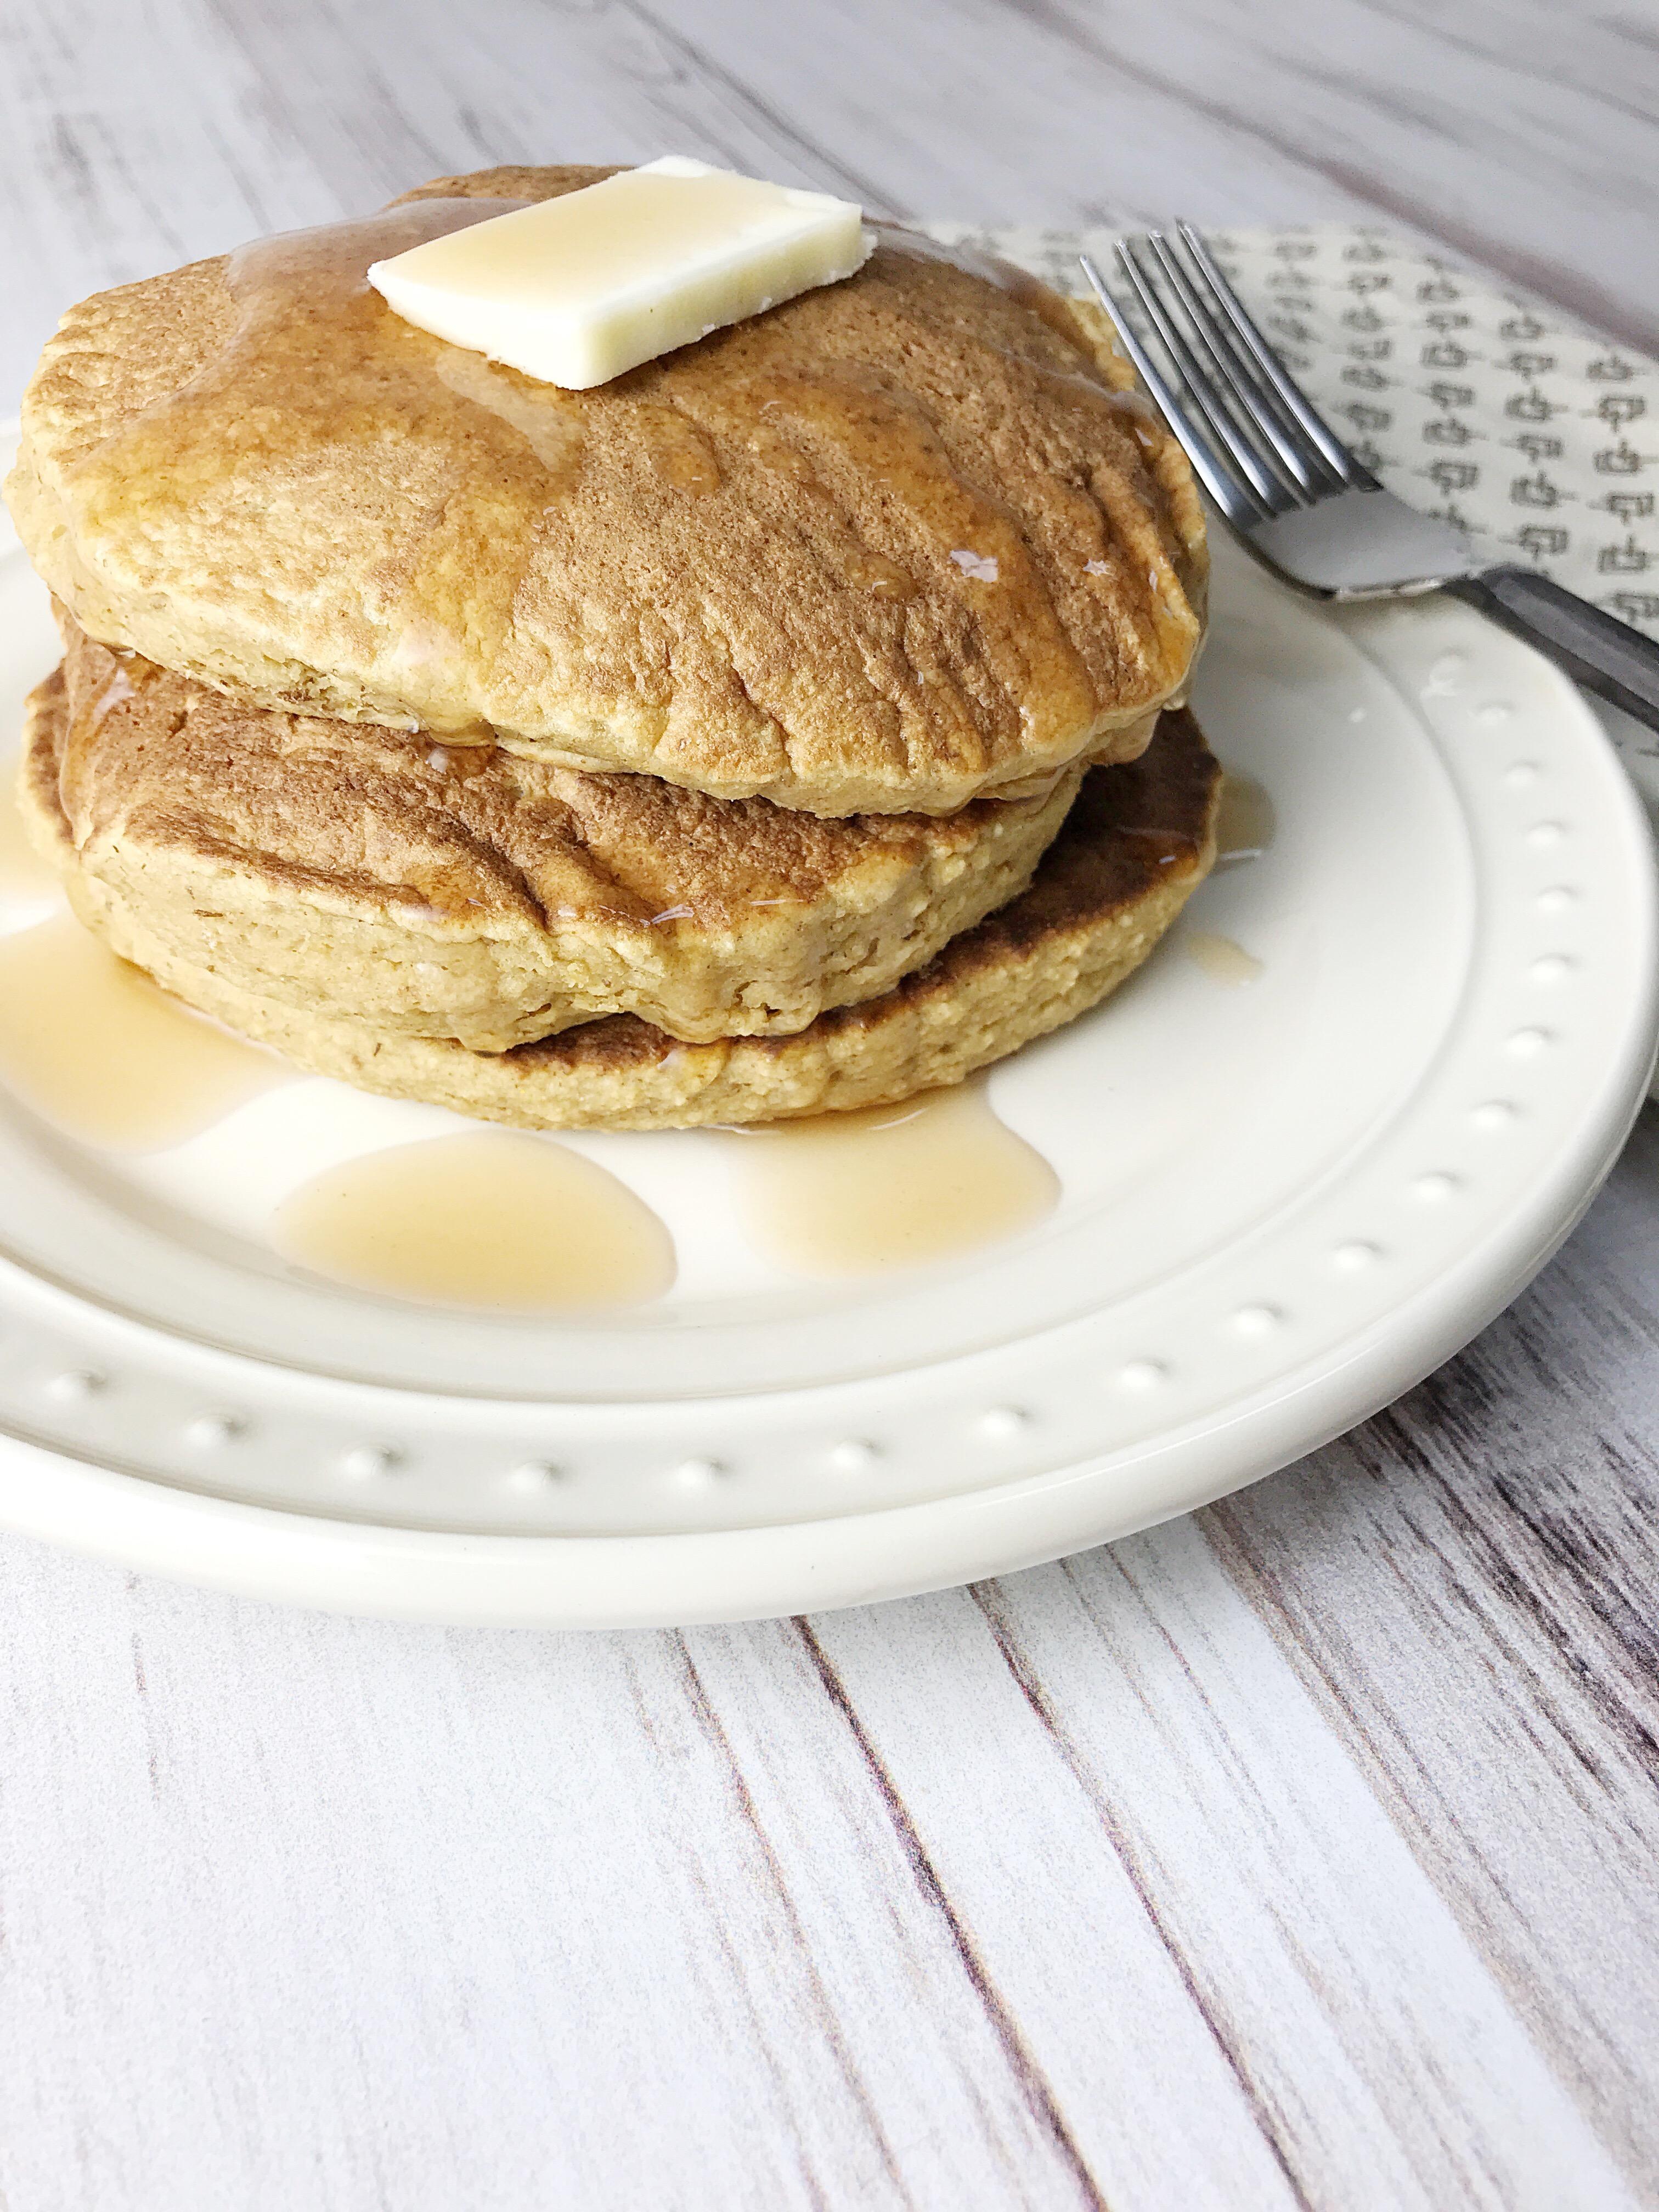 Ihop Griddle Cakes Recipe